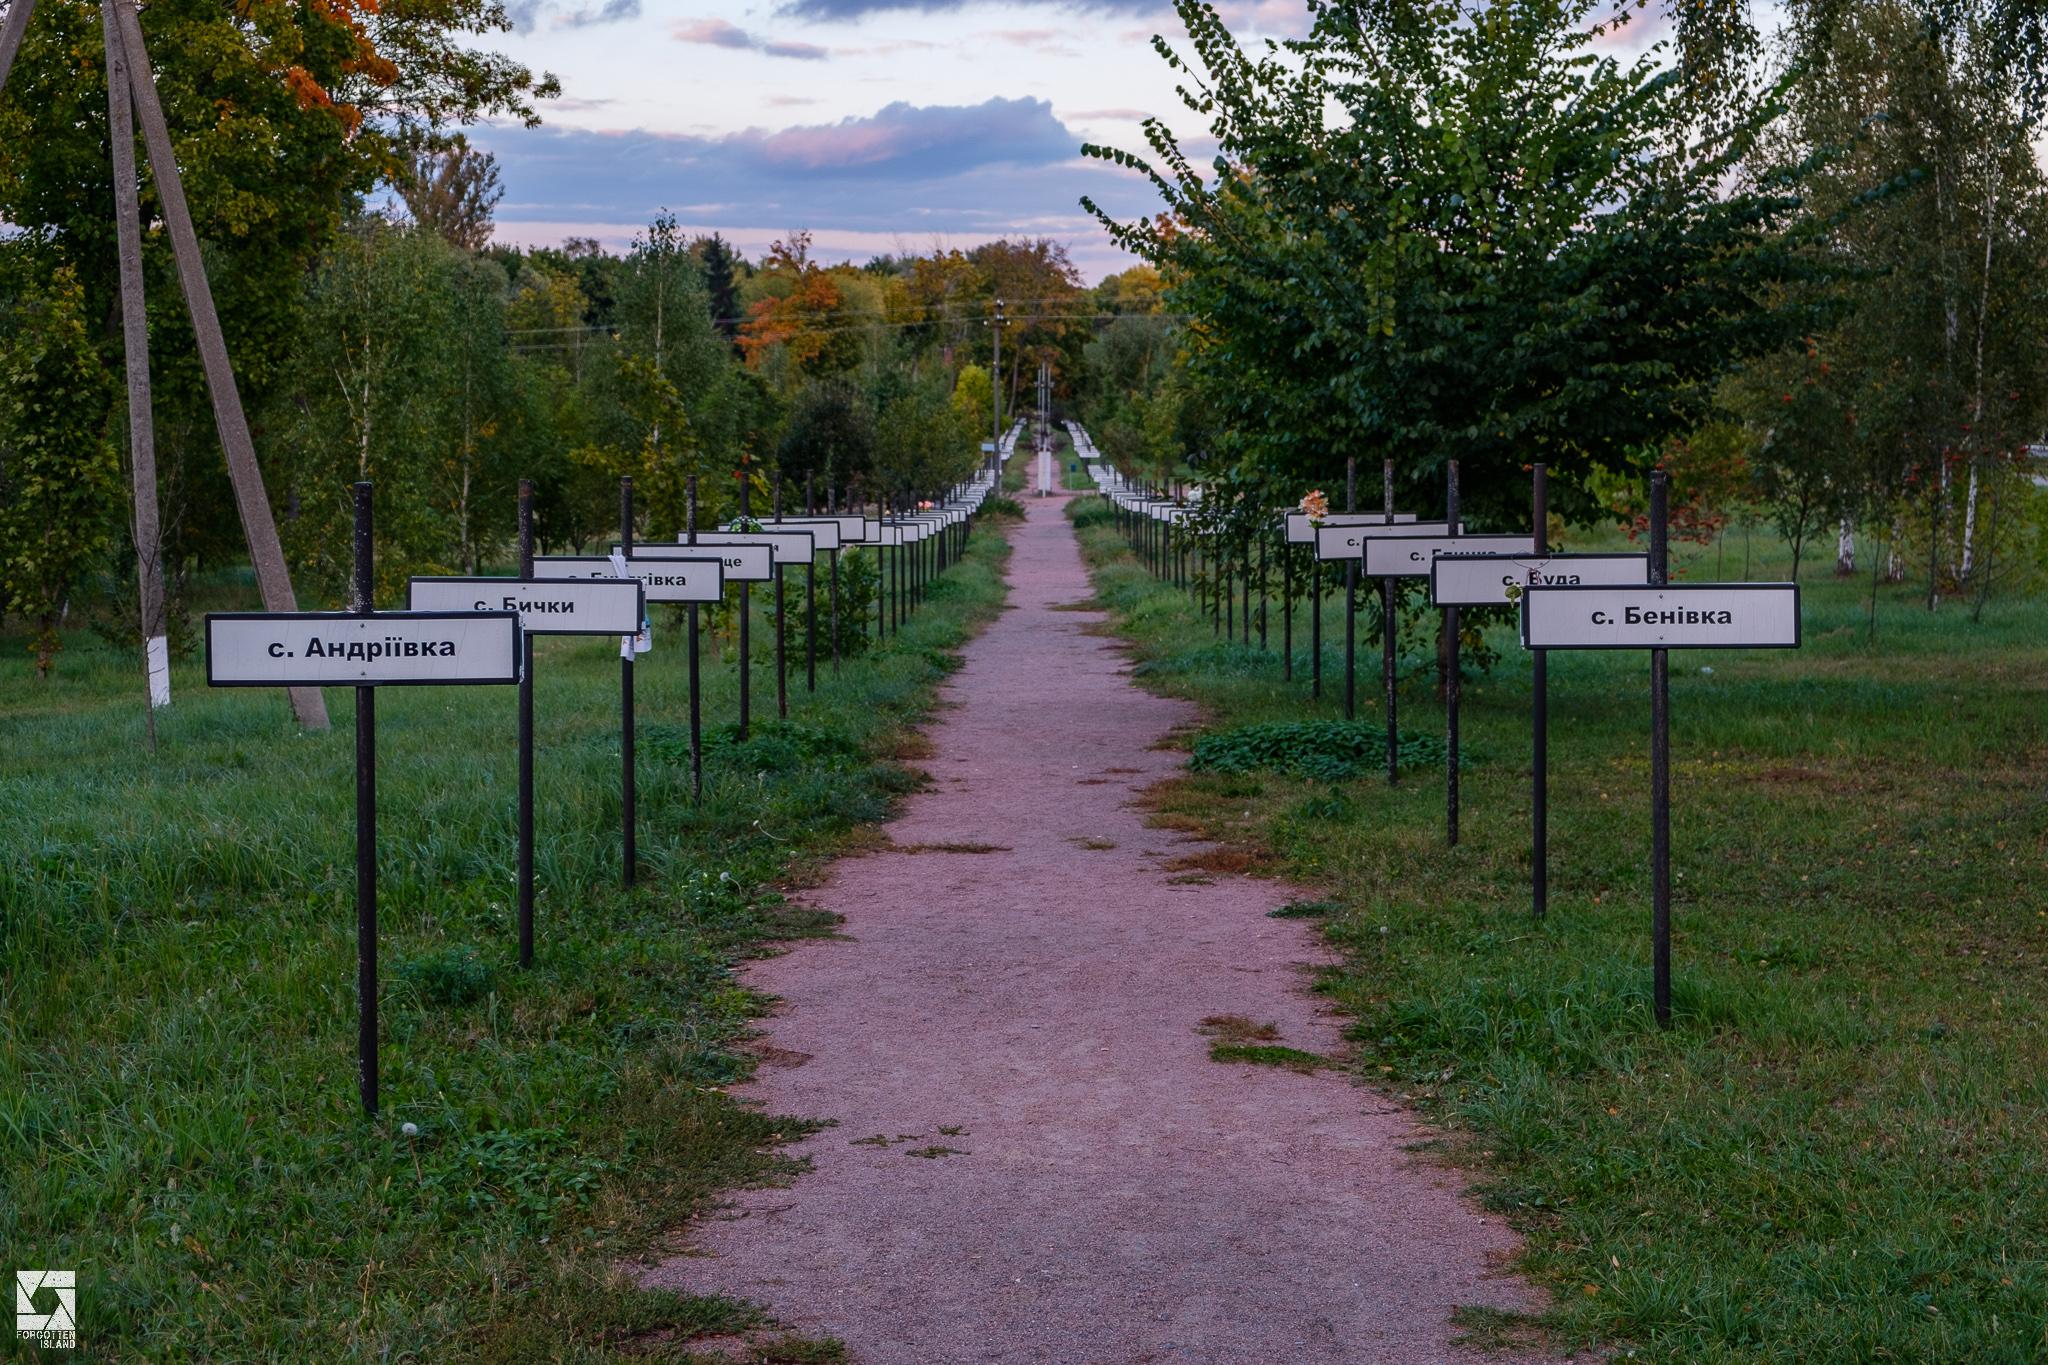 Chernobyl City Today